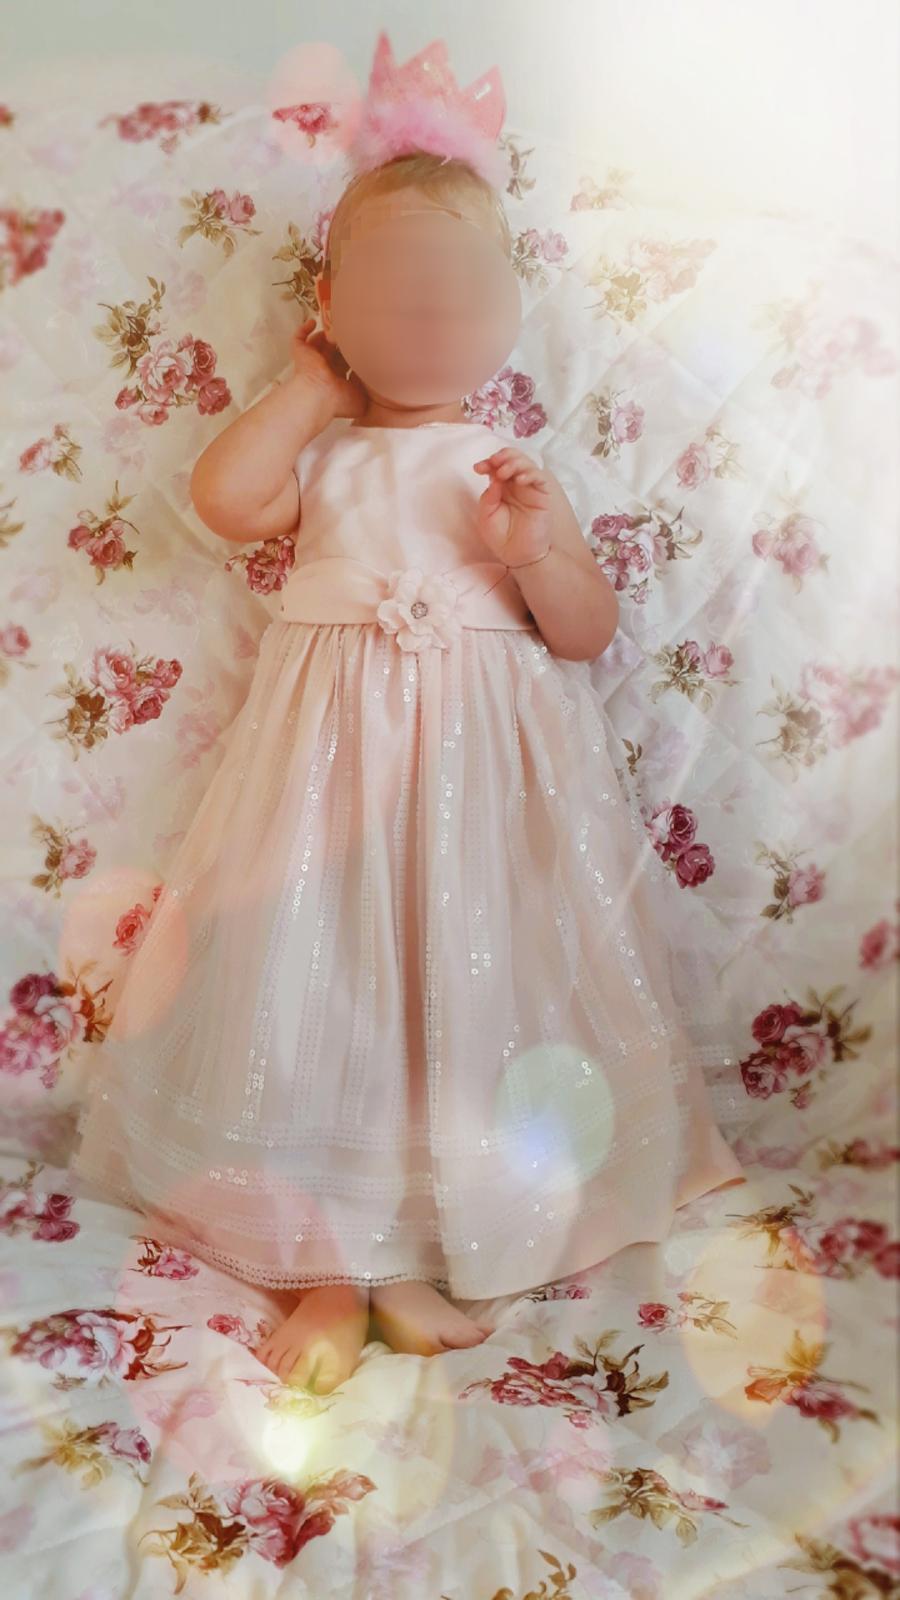 Luxusné princess šaty - Obrázok č. 1